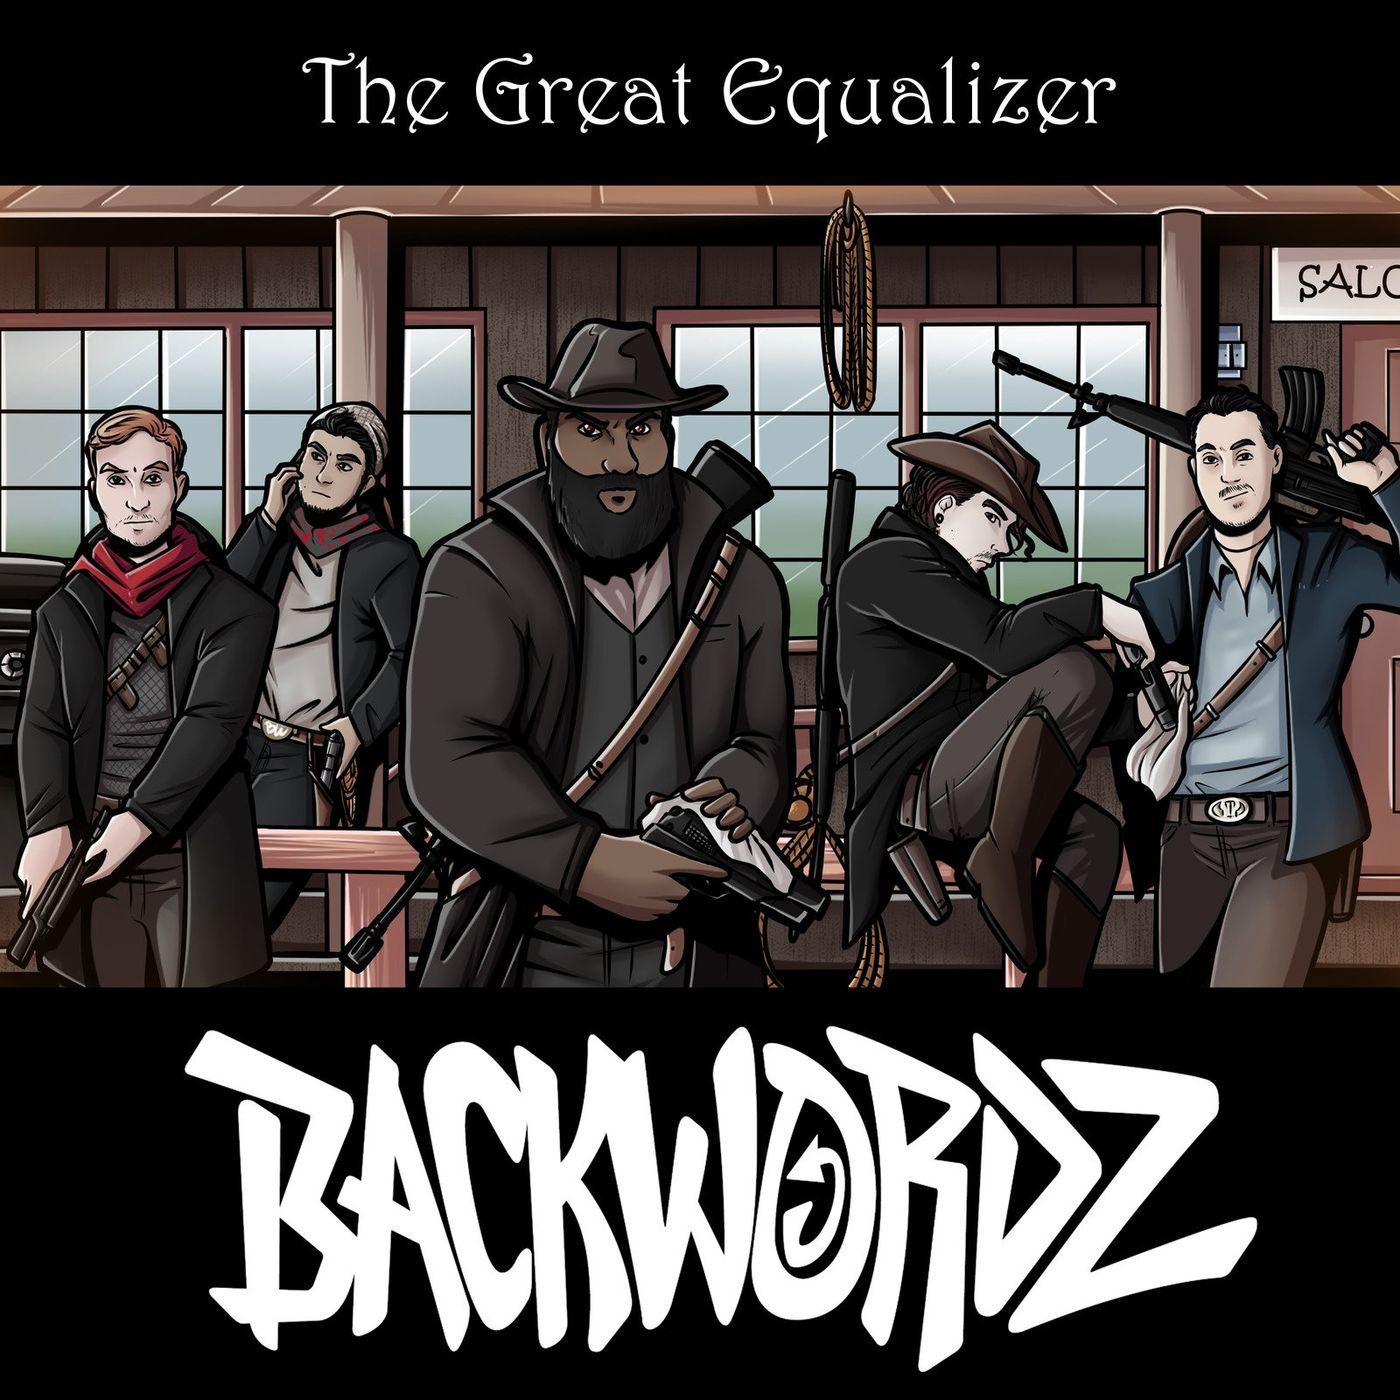 BackWordz - The Great Equalizer [single] (2020)